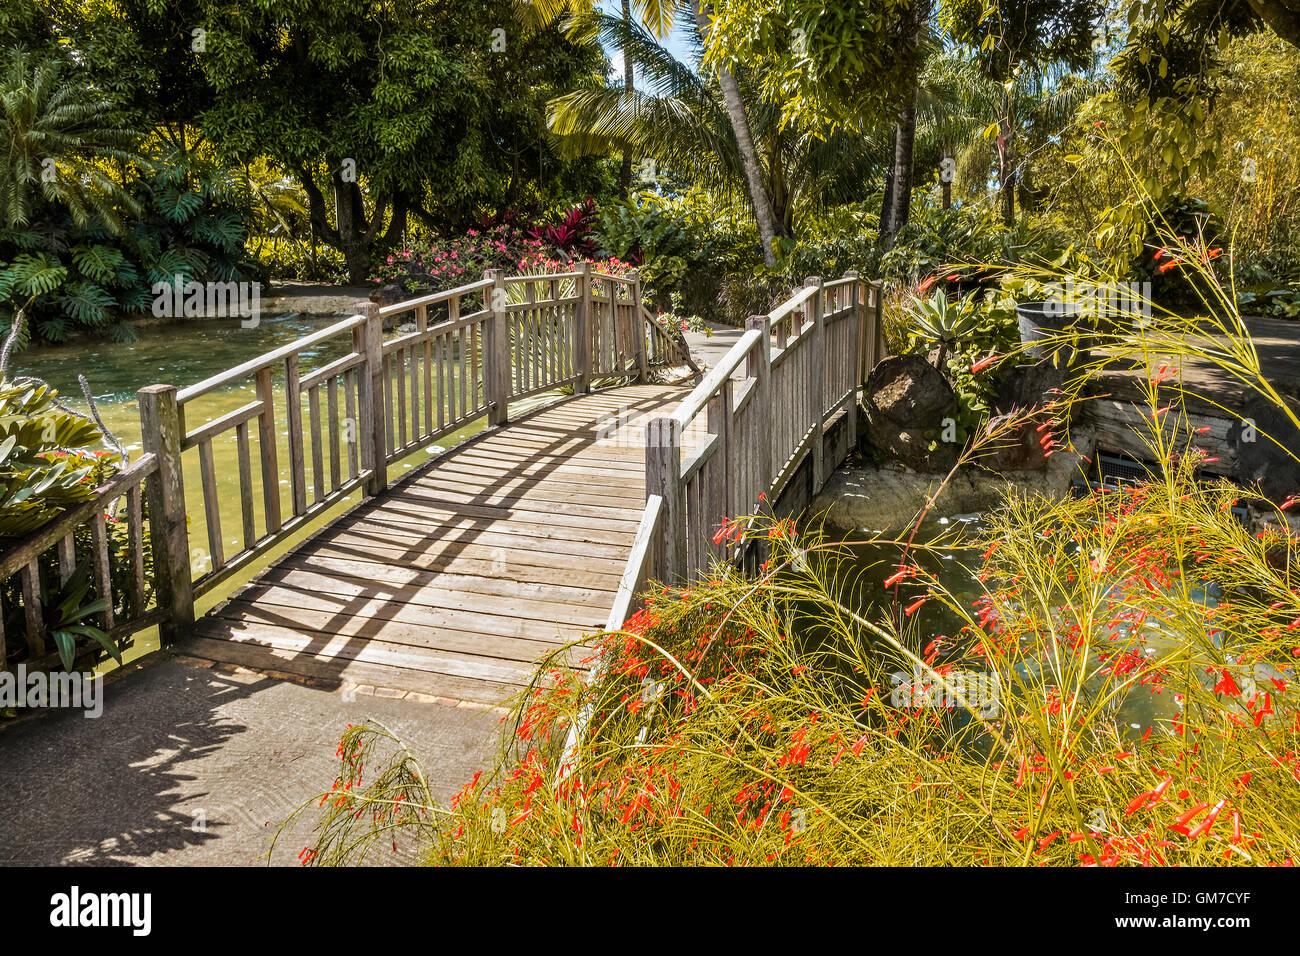 Bridge Across Watercourse Balata Botanical Gardens Guadeloupe West Indies - Stock Image